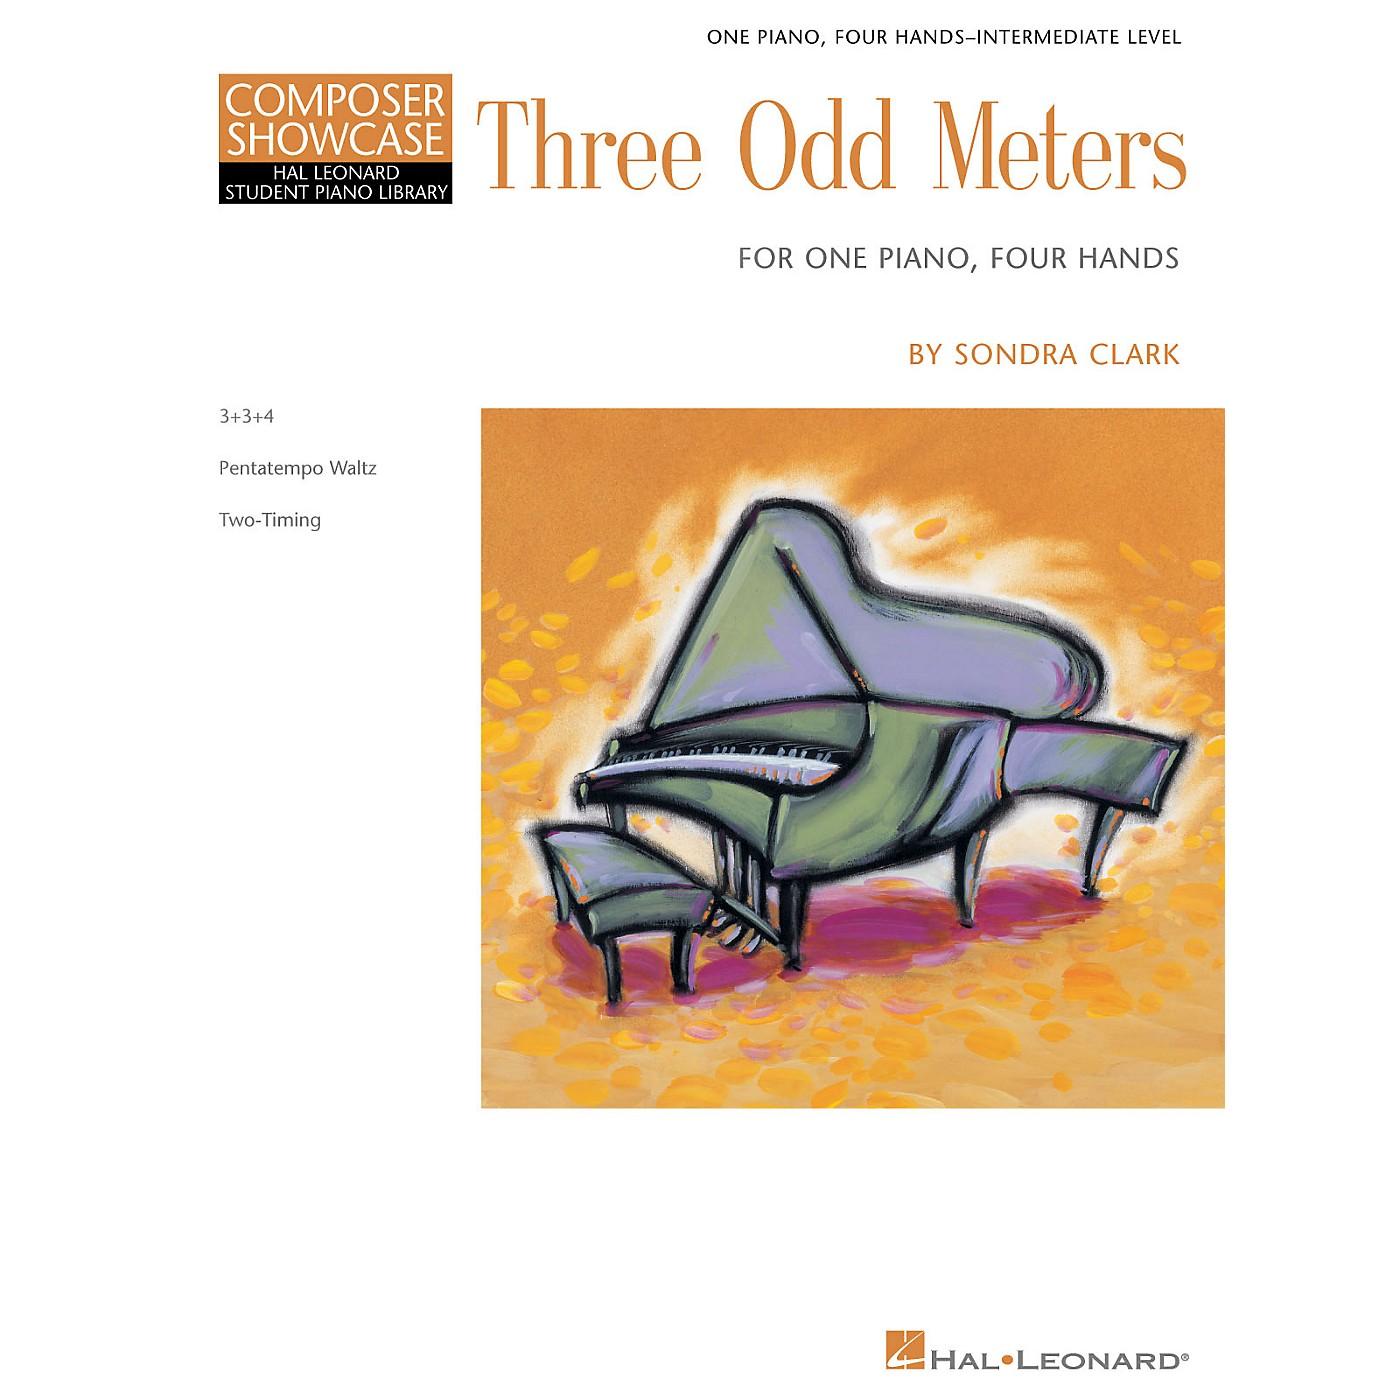 Hal Leonard Three Odd Meters Piano Library Series Book by Sondra Clark (Level Inter) thumbnail